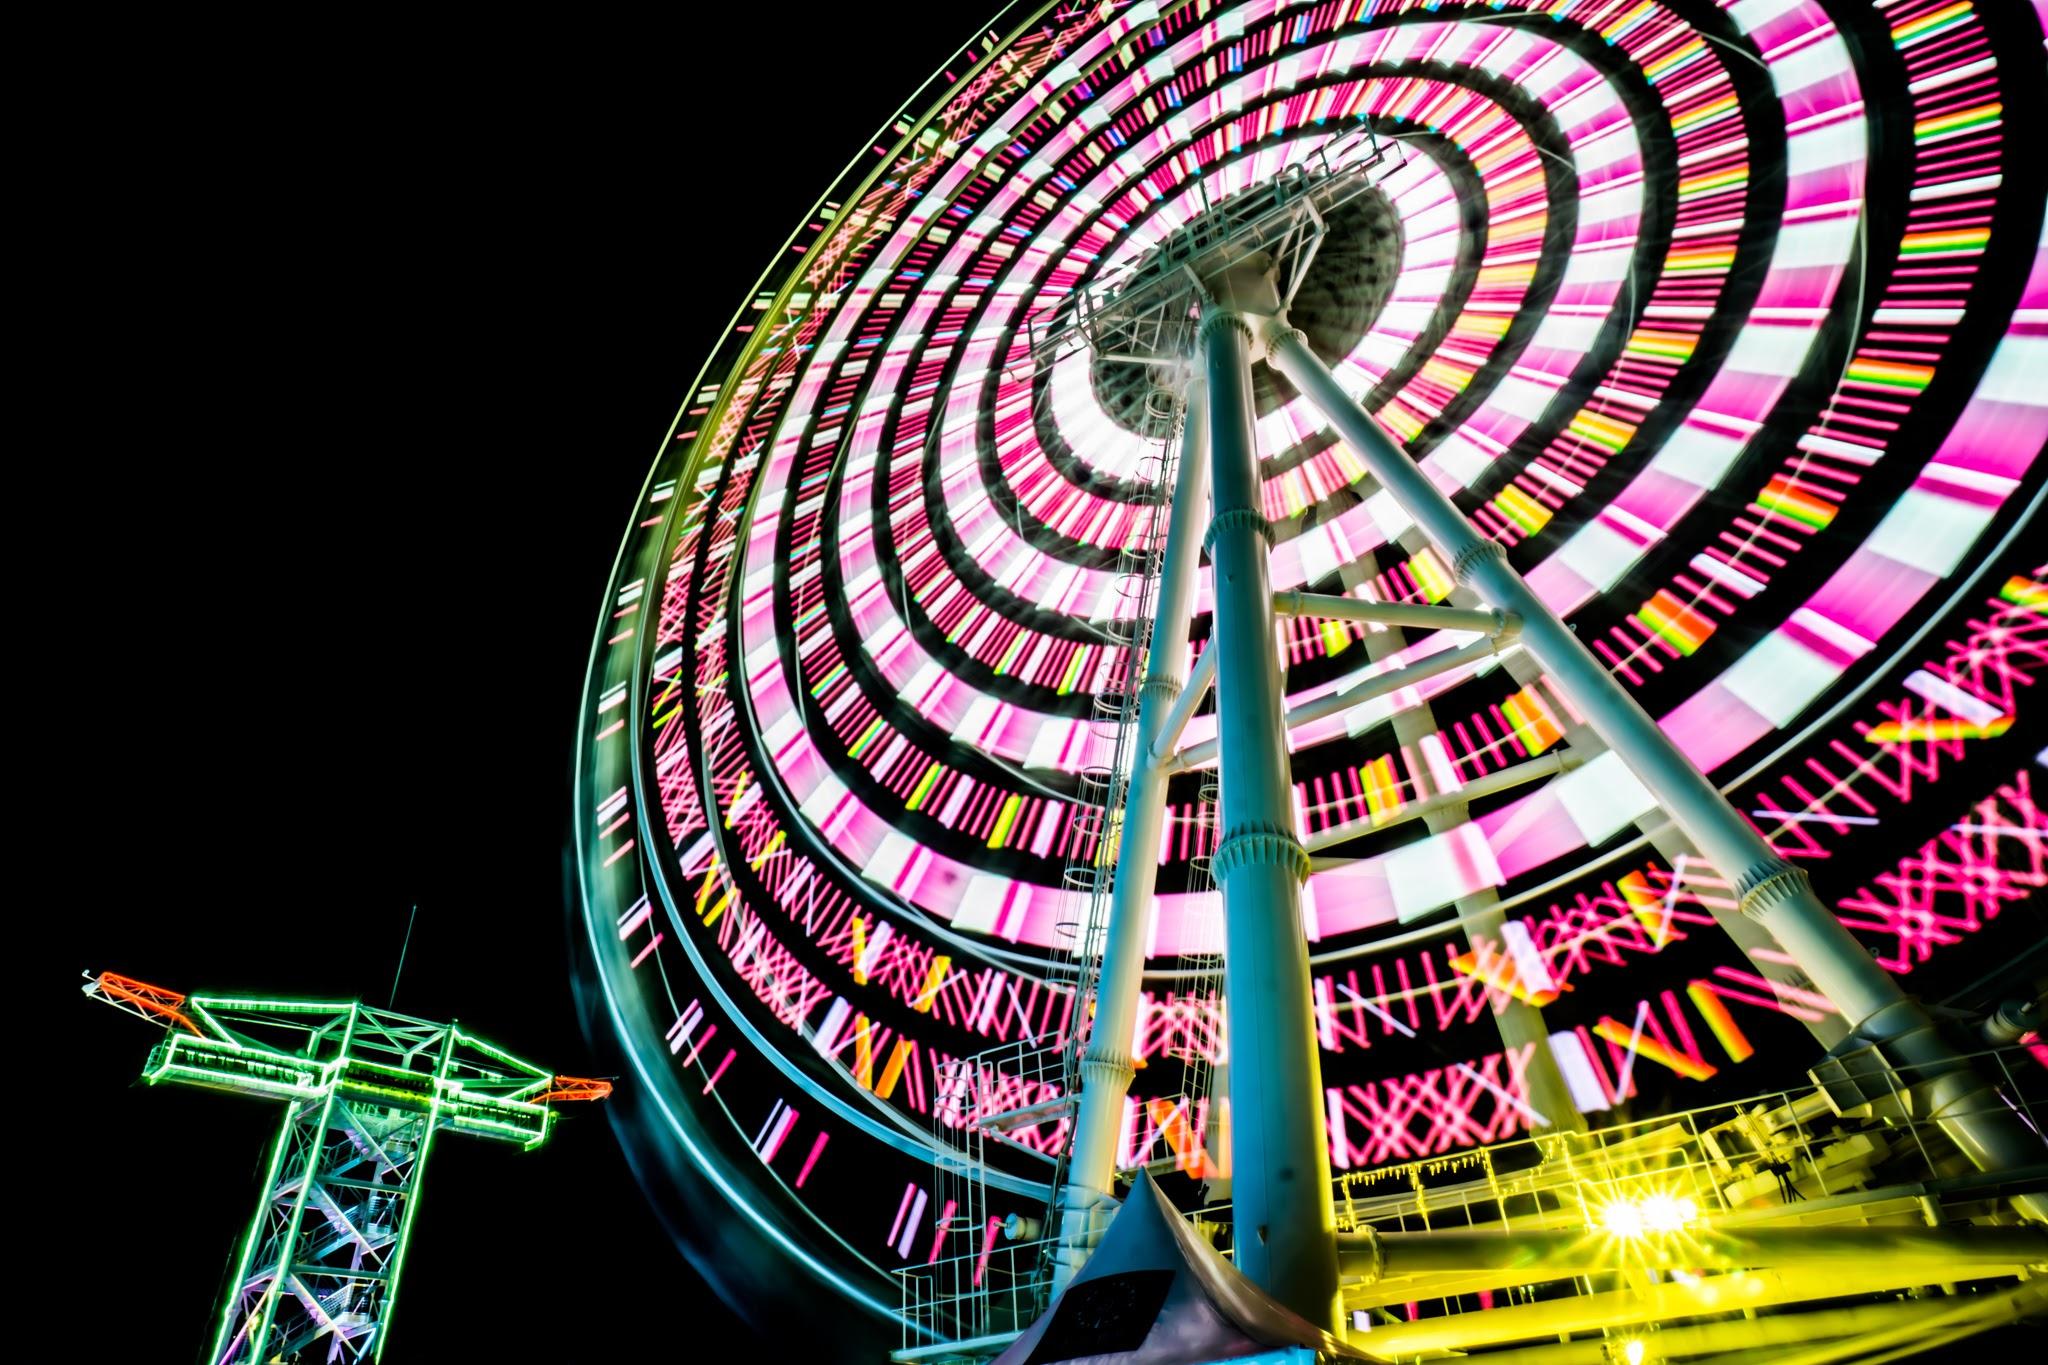 Huis Ten Bosch illumination Kingdom of light White ferris wheel